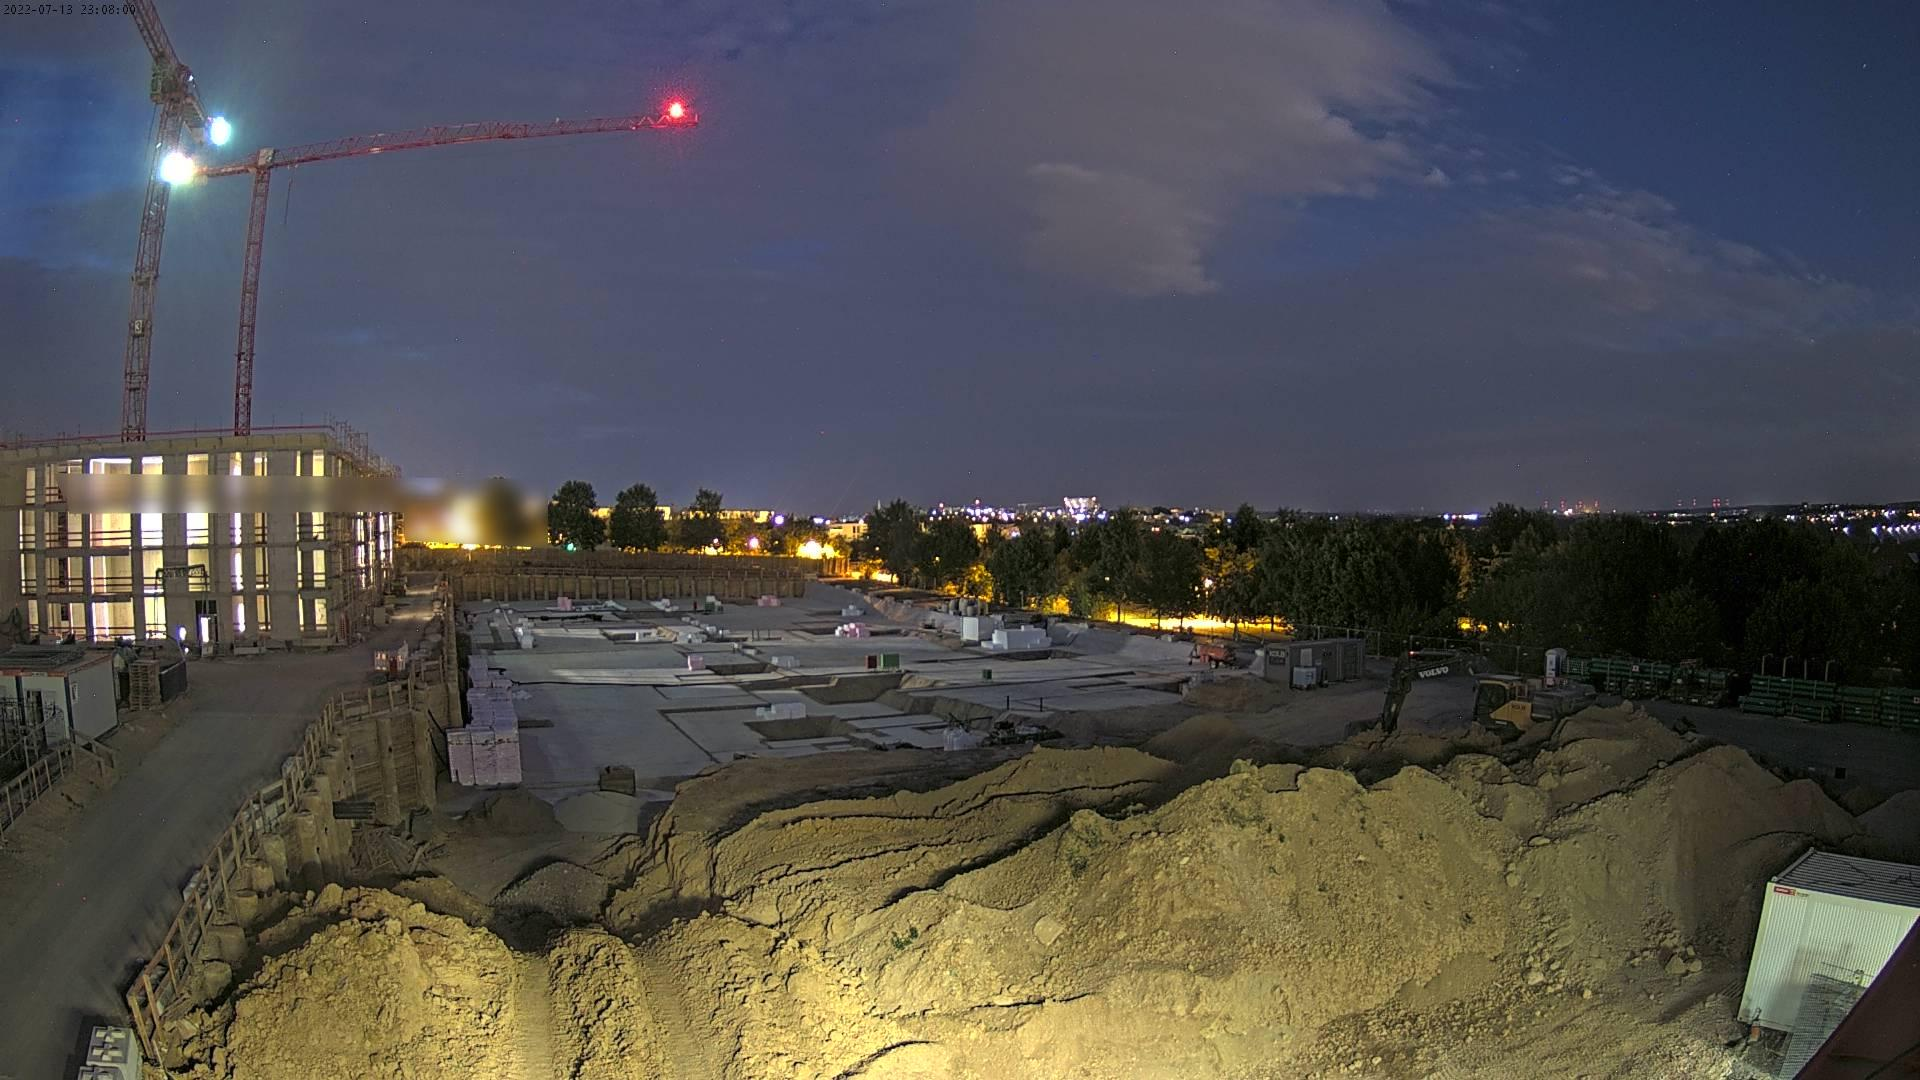 Webcam - Bauprojekt Frankfurt Berghöfe